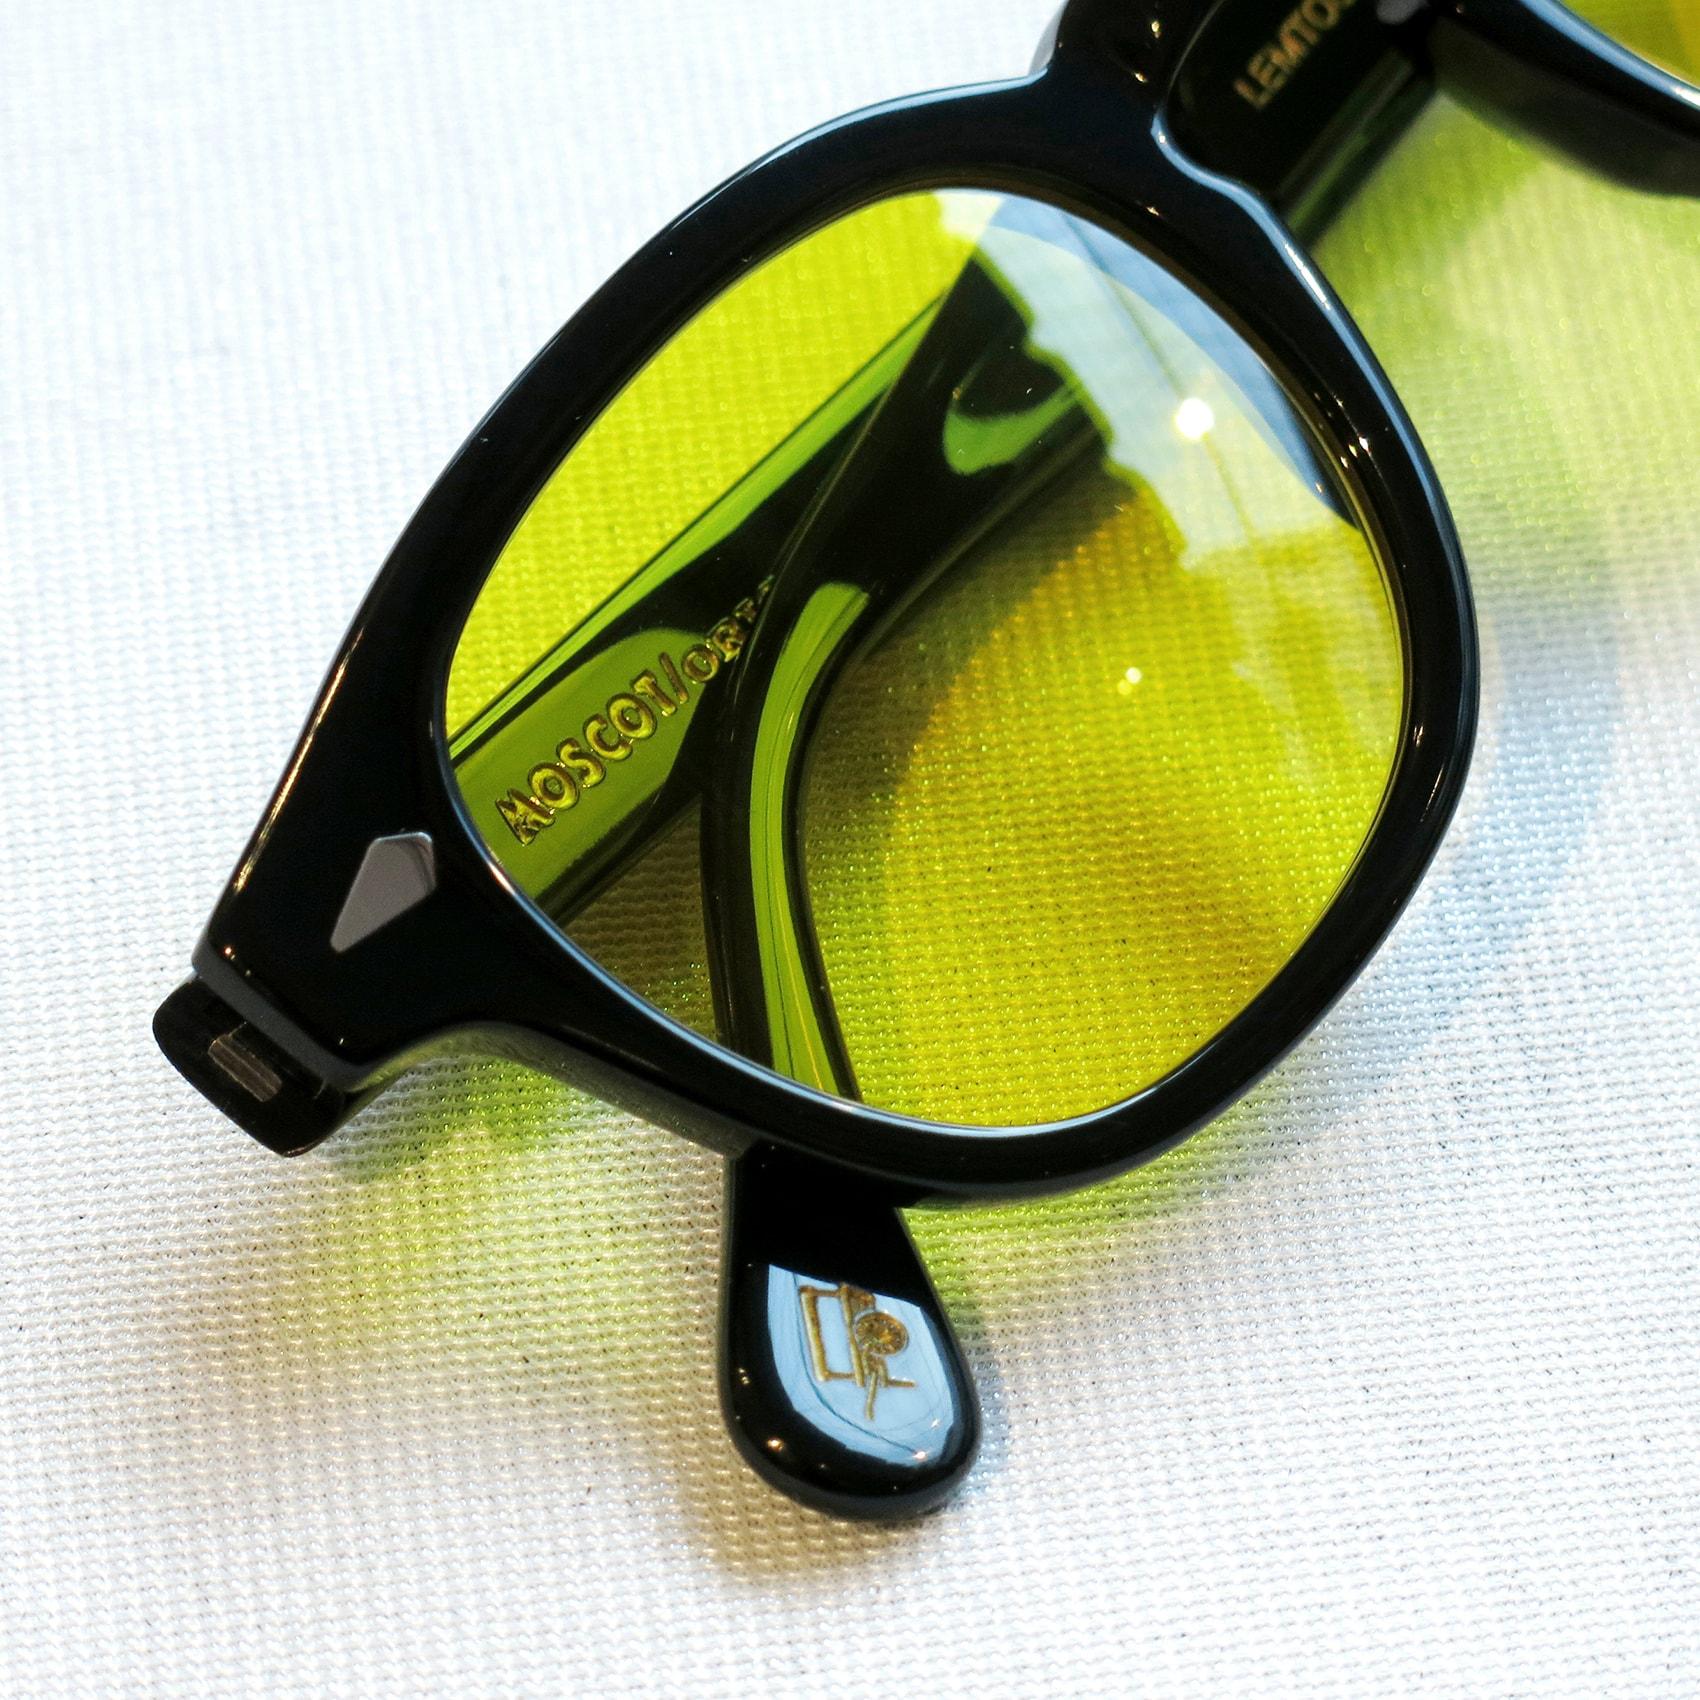 170818_arnel-lemtosh-sunglasses_yellows_01